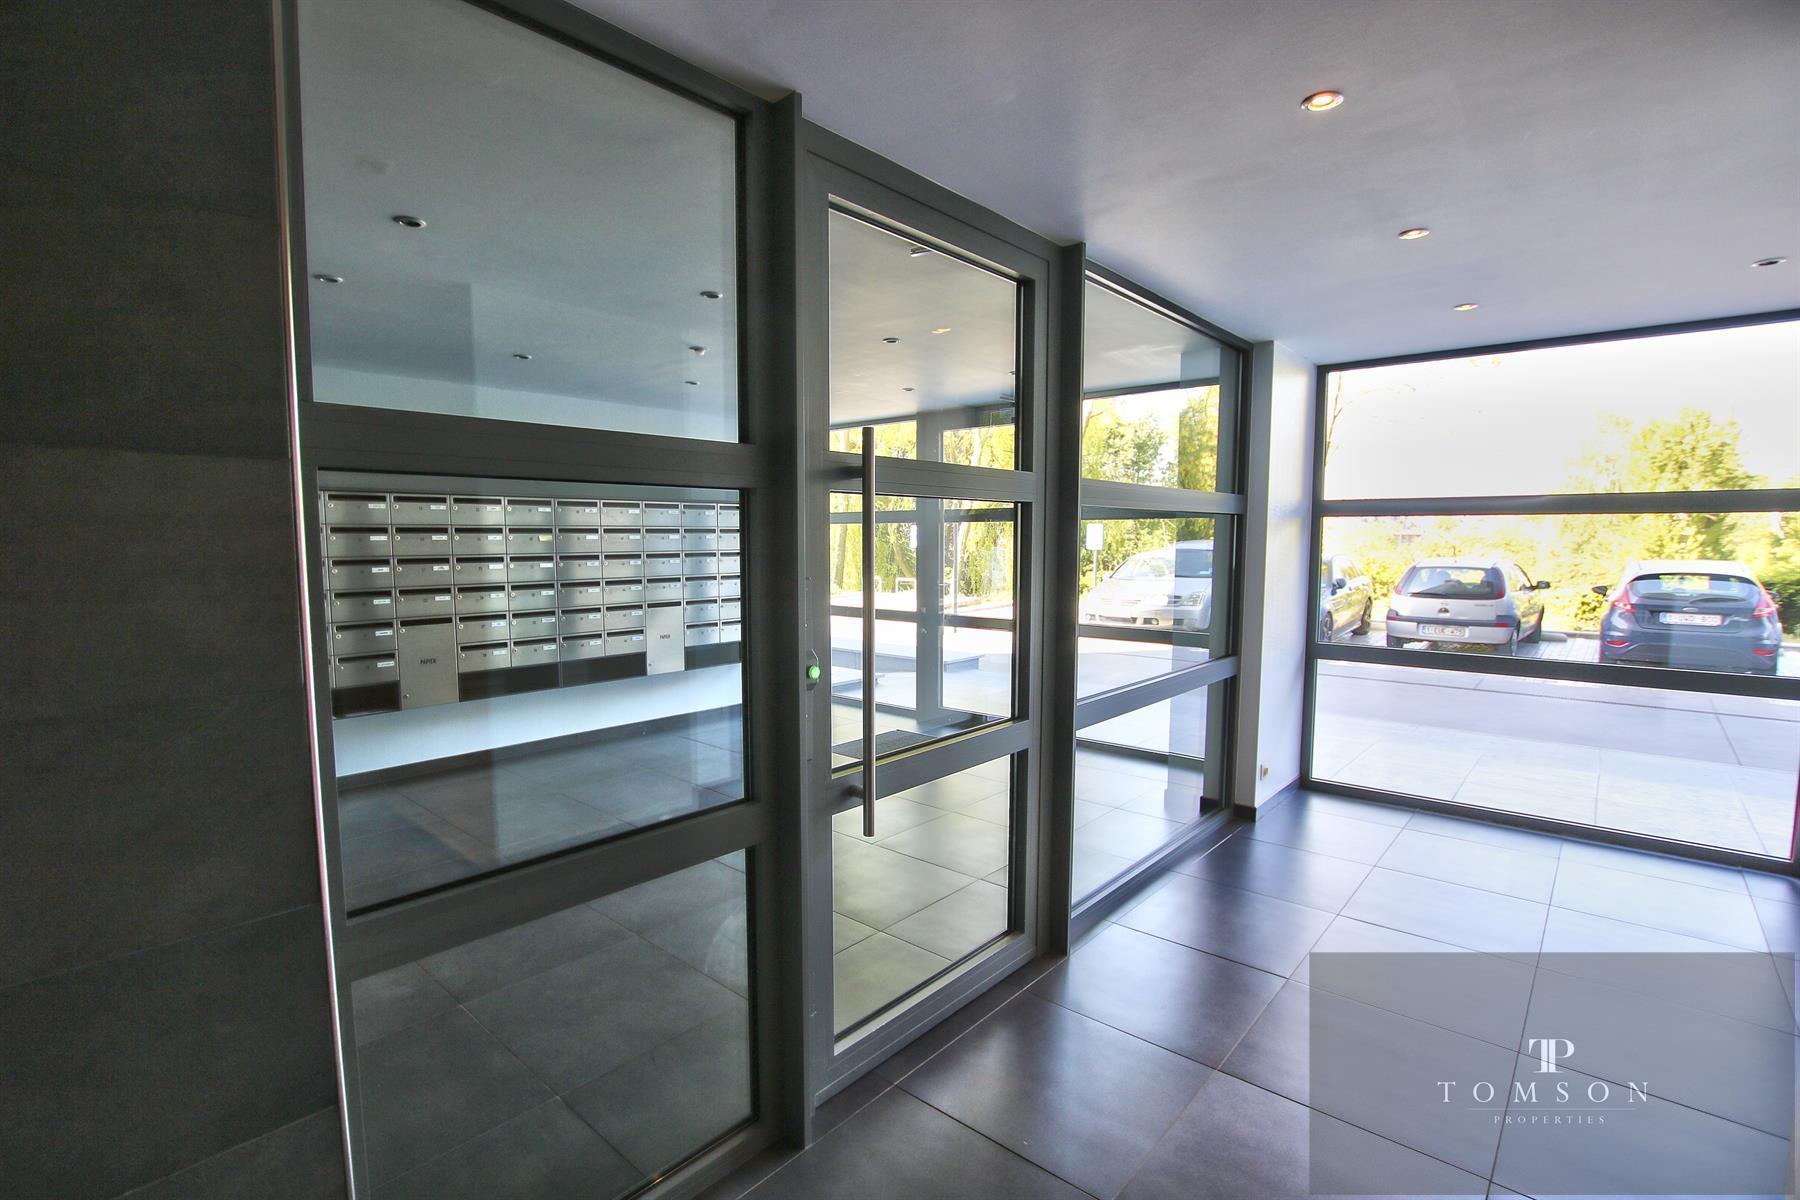 Appartement - Woluwe-Saint-Lambert - #4103299-12